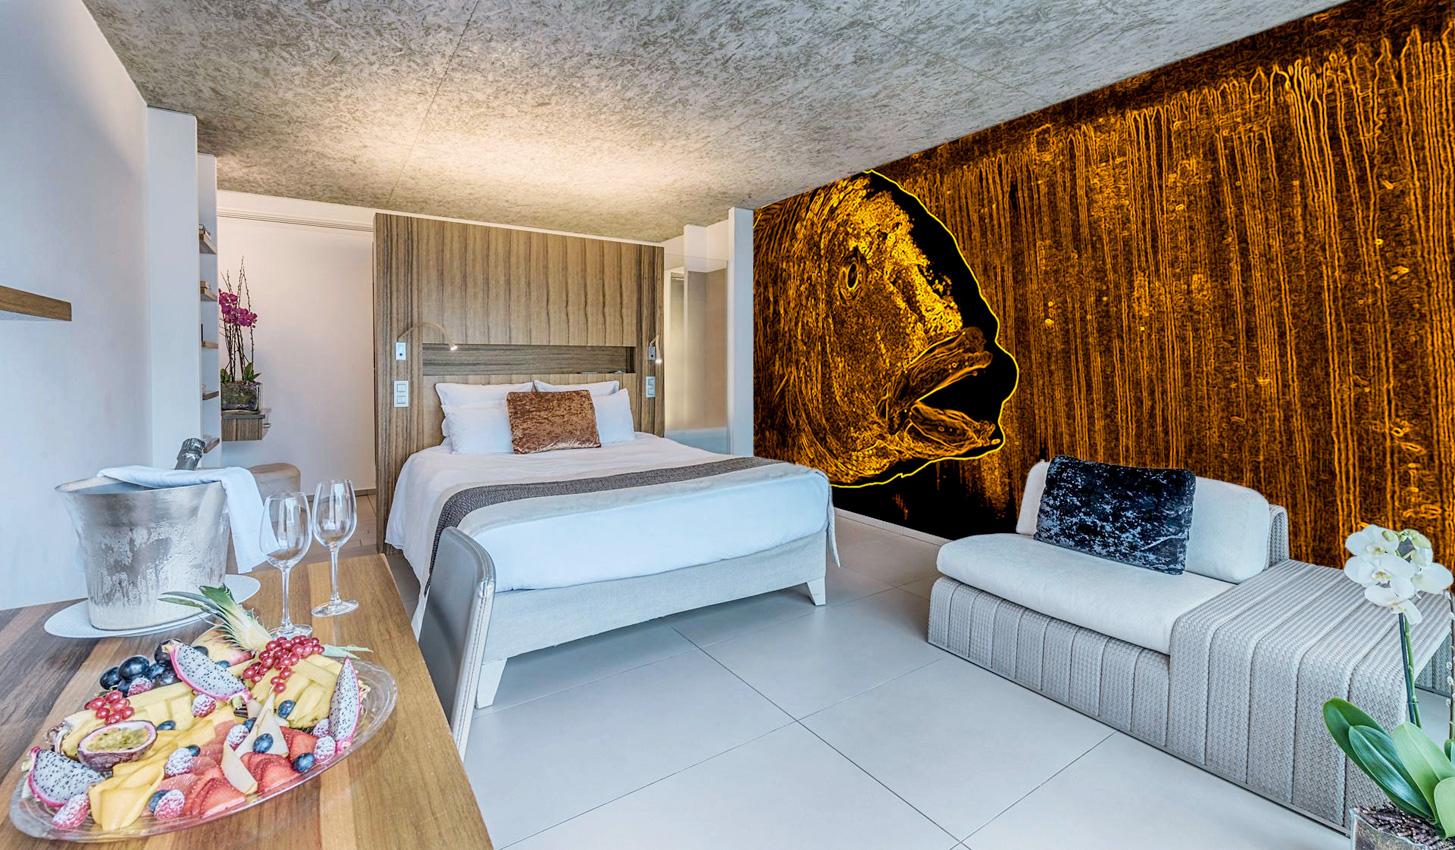 chambre 19 French-Riviera-luxury-hotel-Thierry Bisch Animal ...